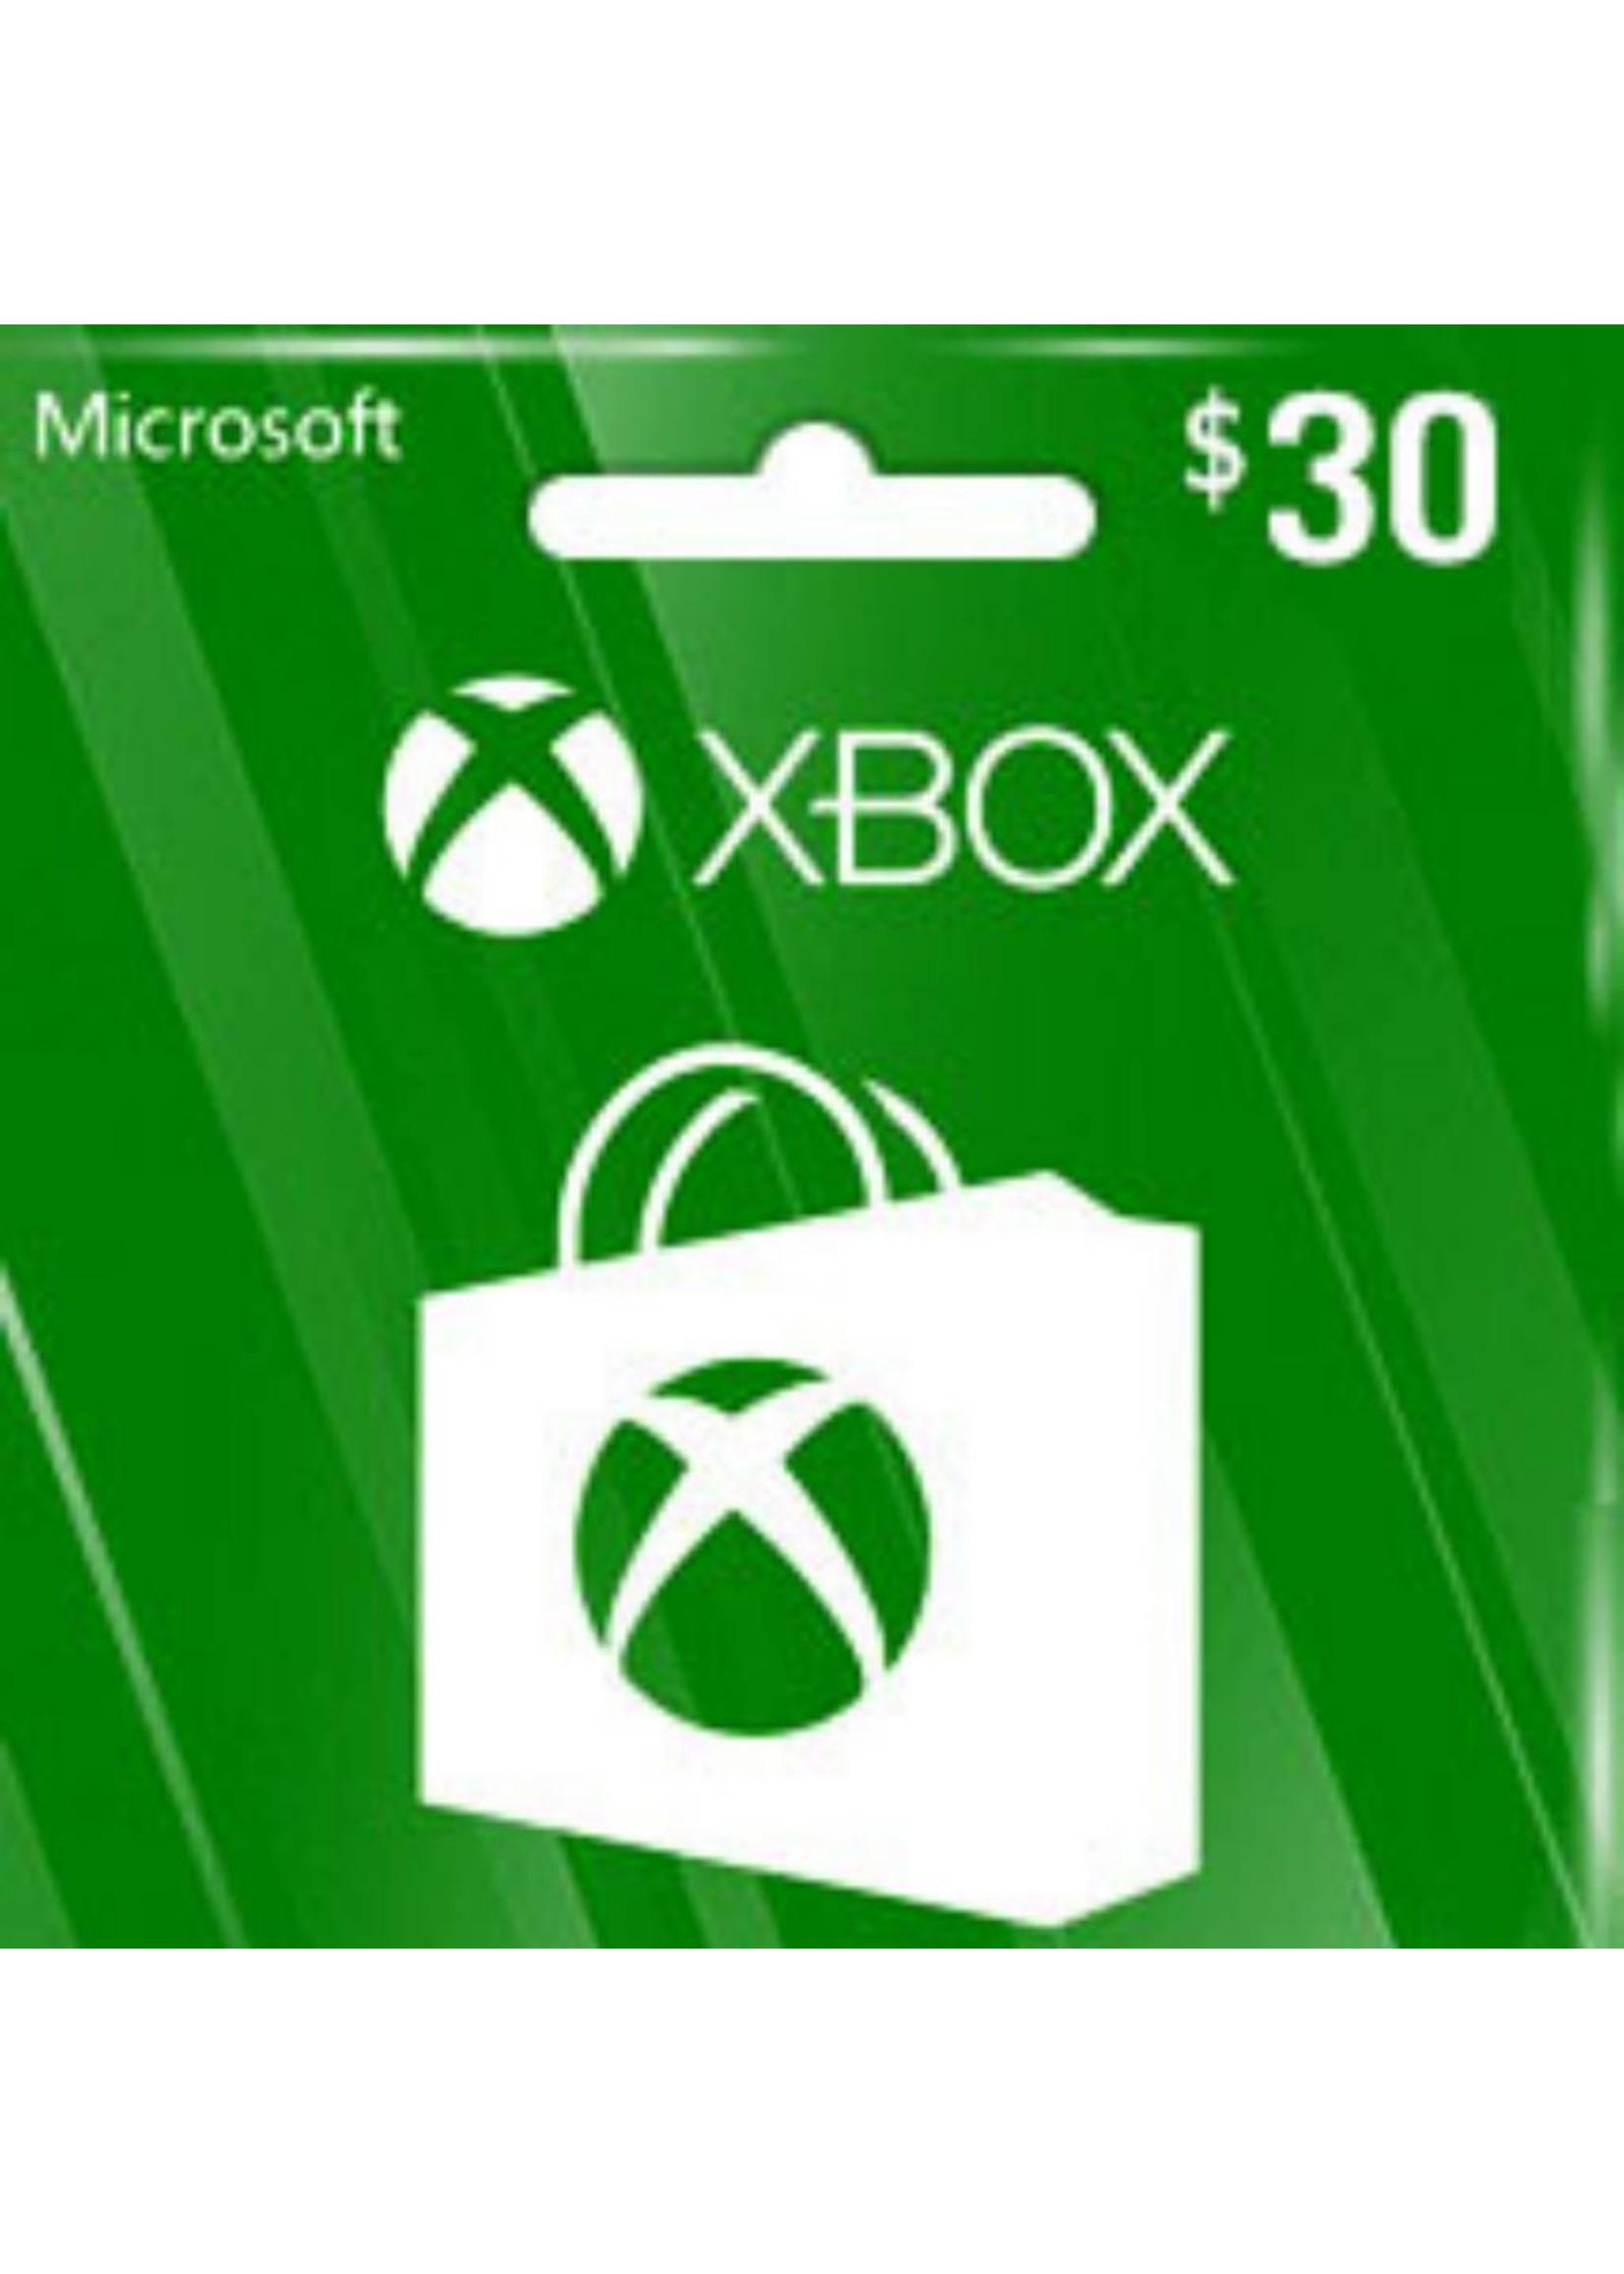 Microsoft Microsoft XBOX $30